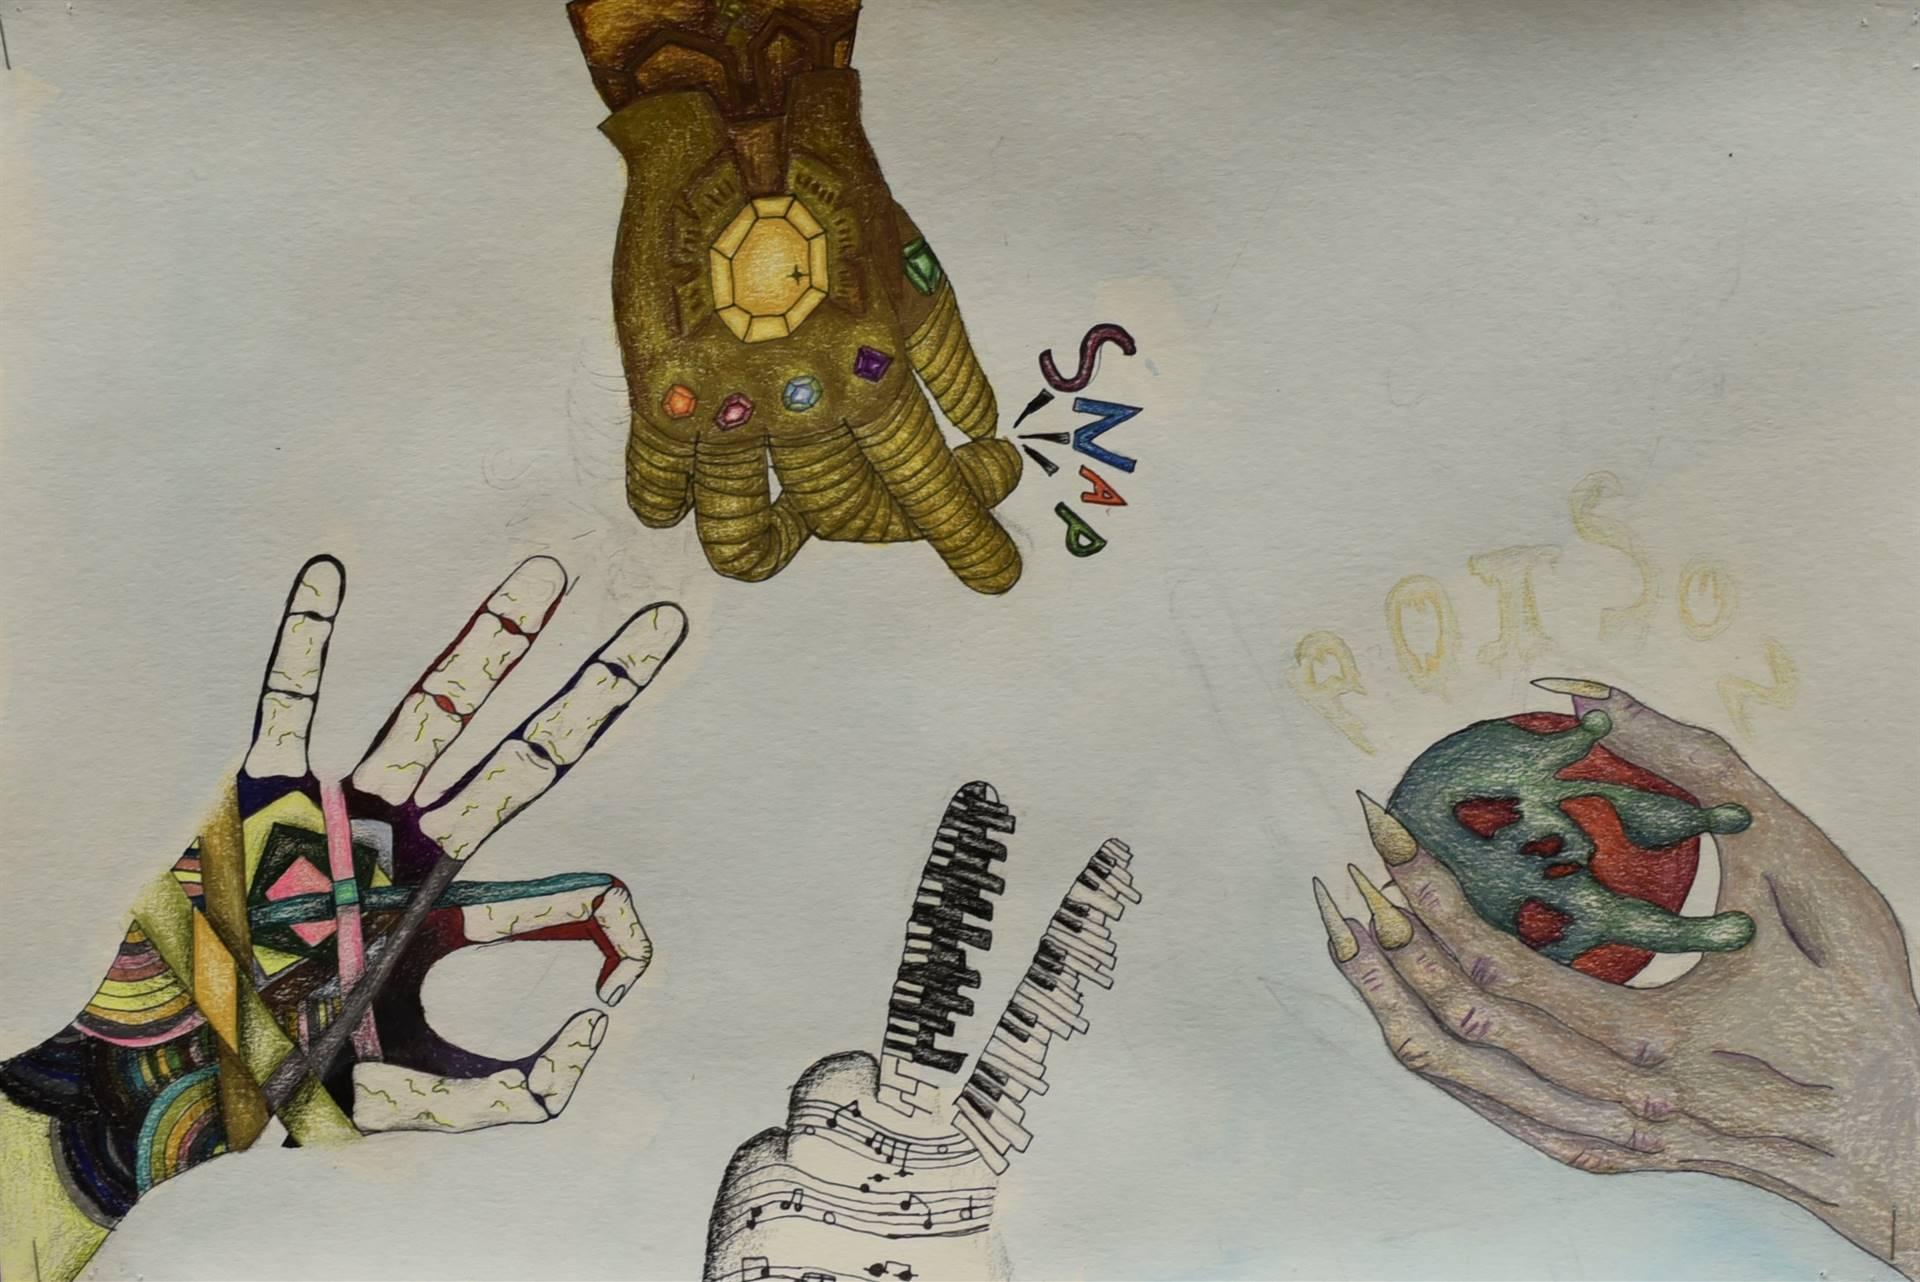 Brecksville-Broadview Hts. Middle School Art Projects 52